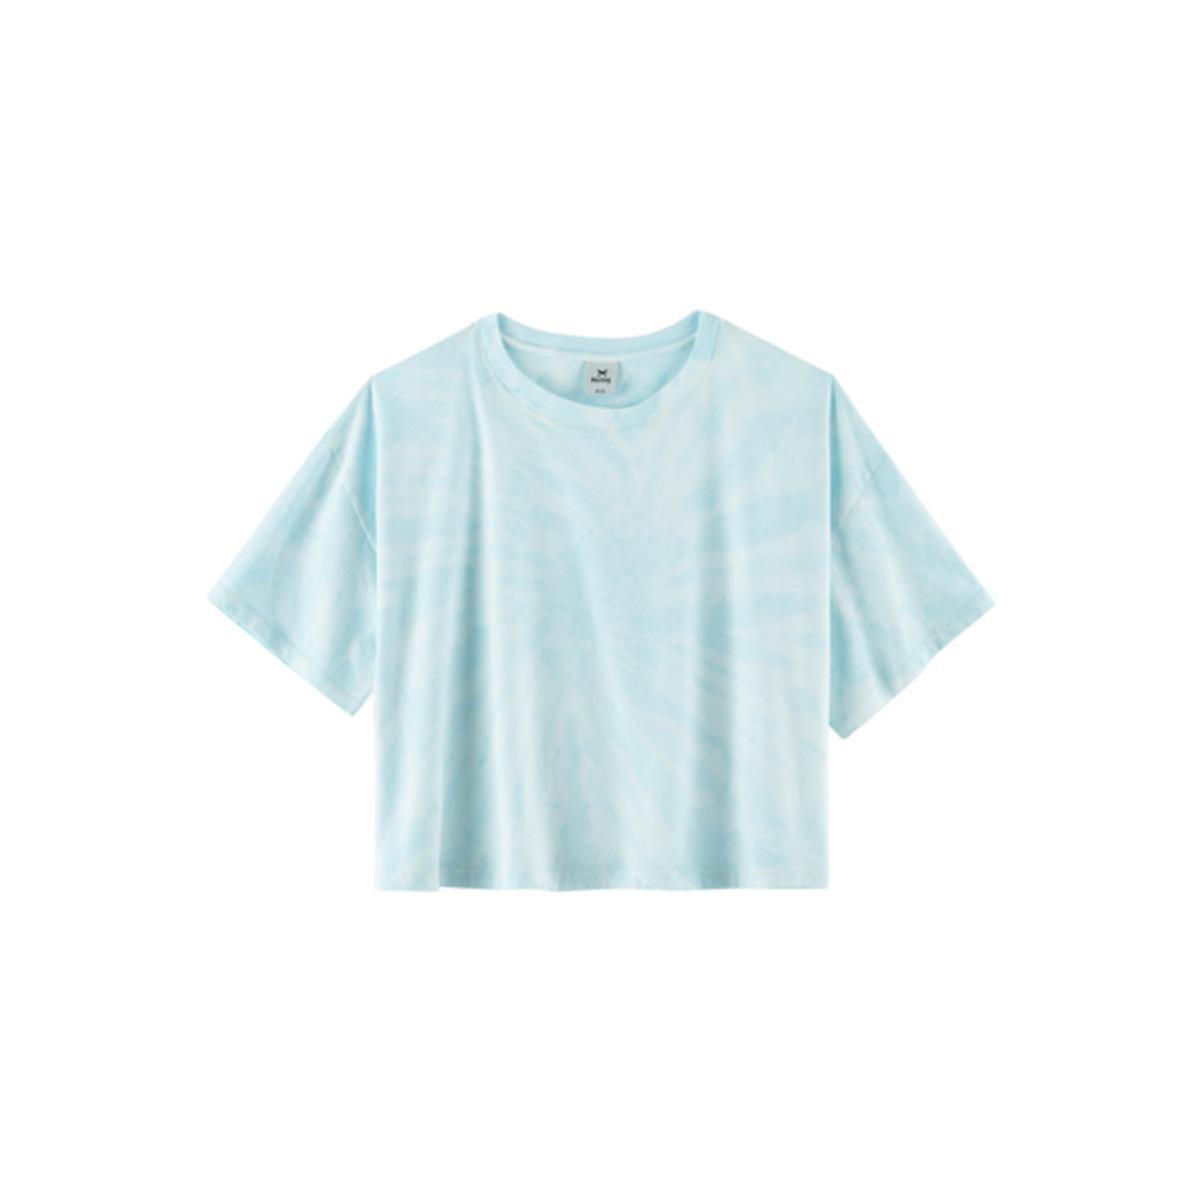 Blusa Feminina Hering 4fau 1cen Azul